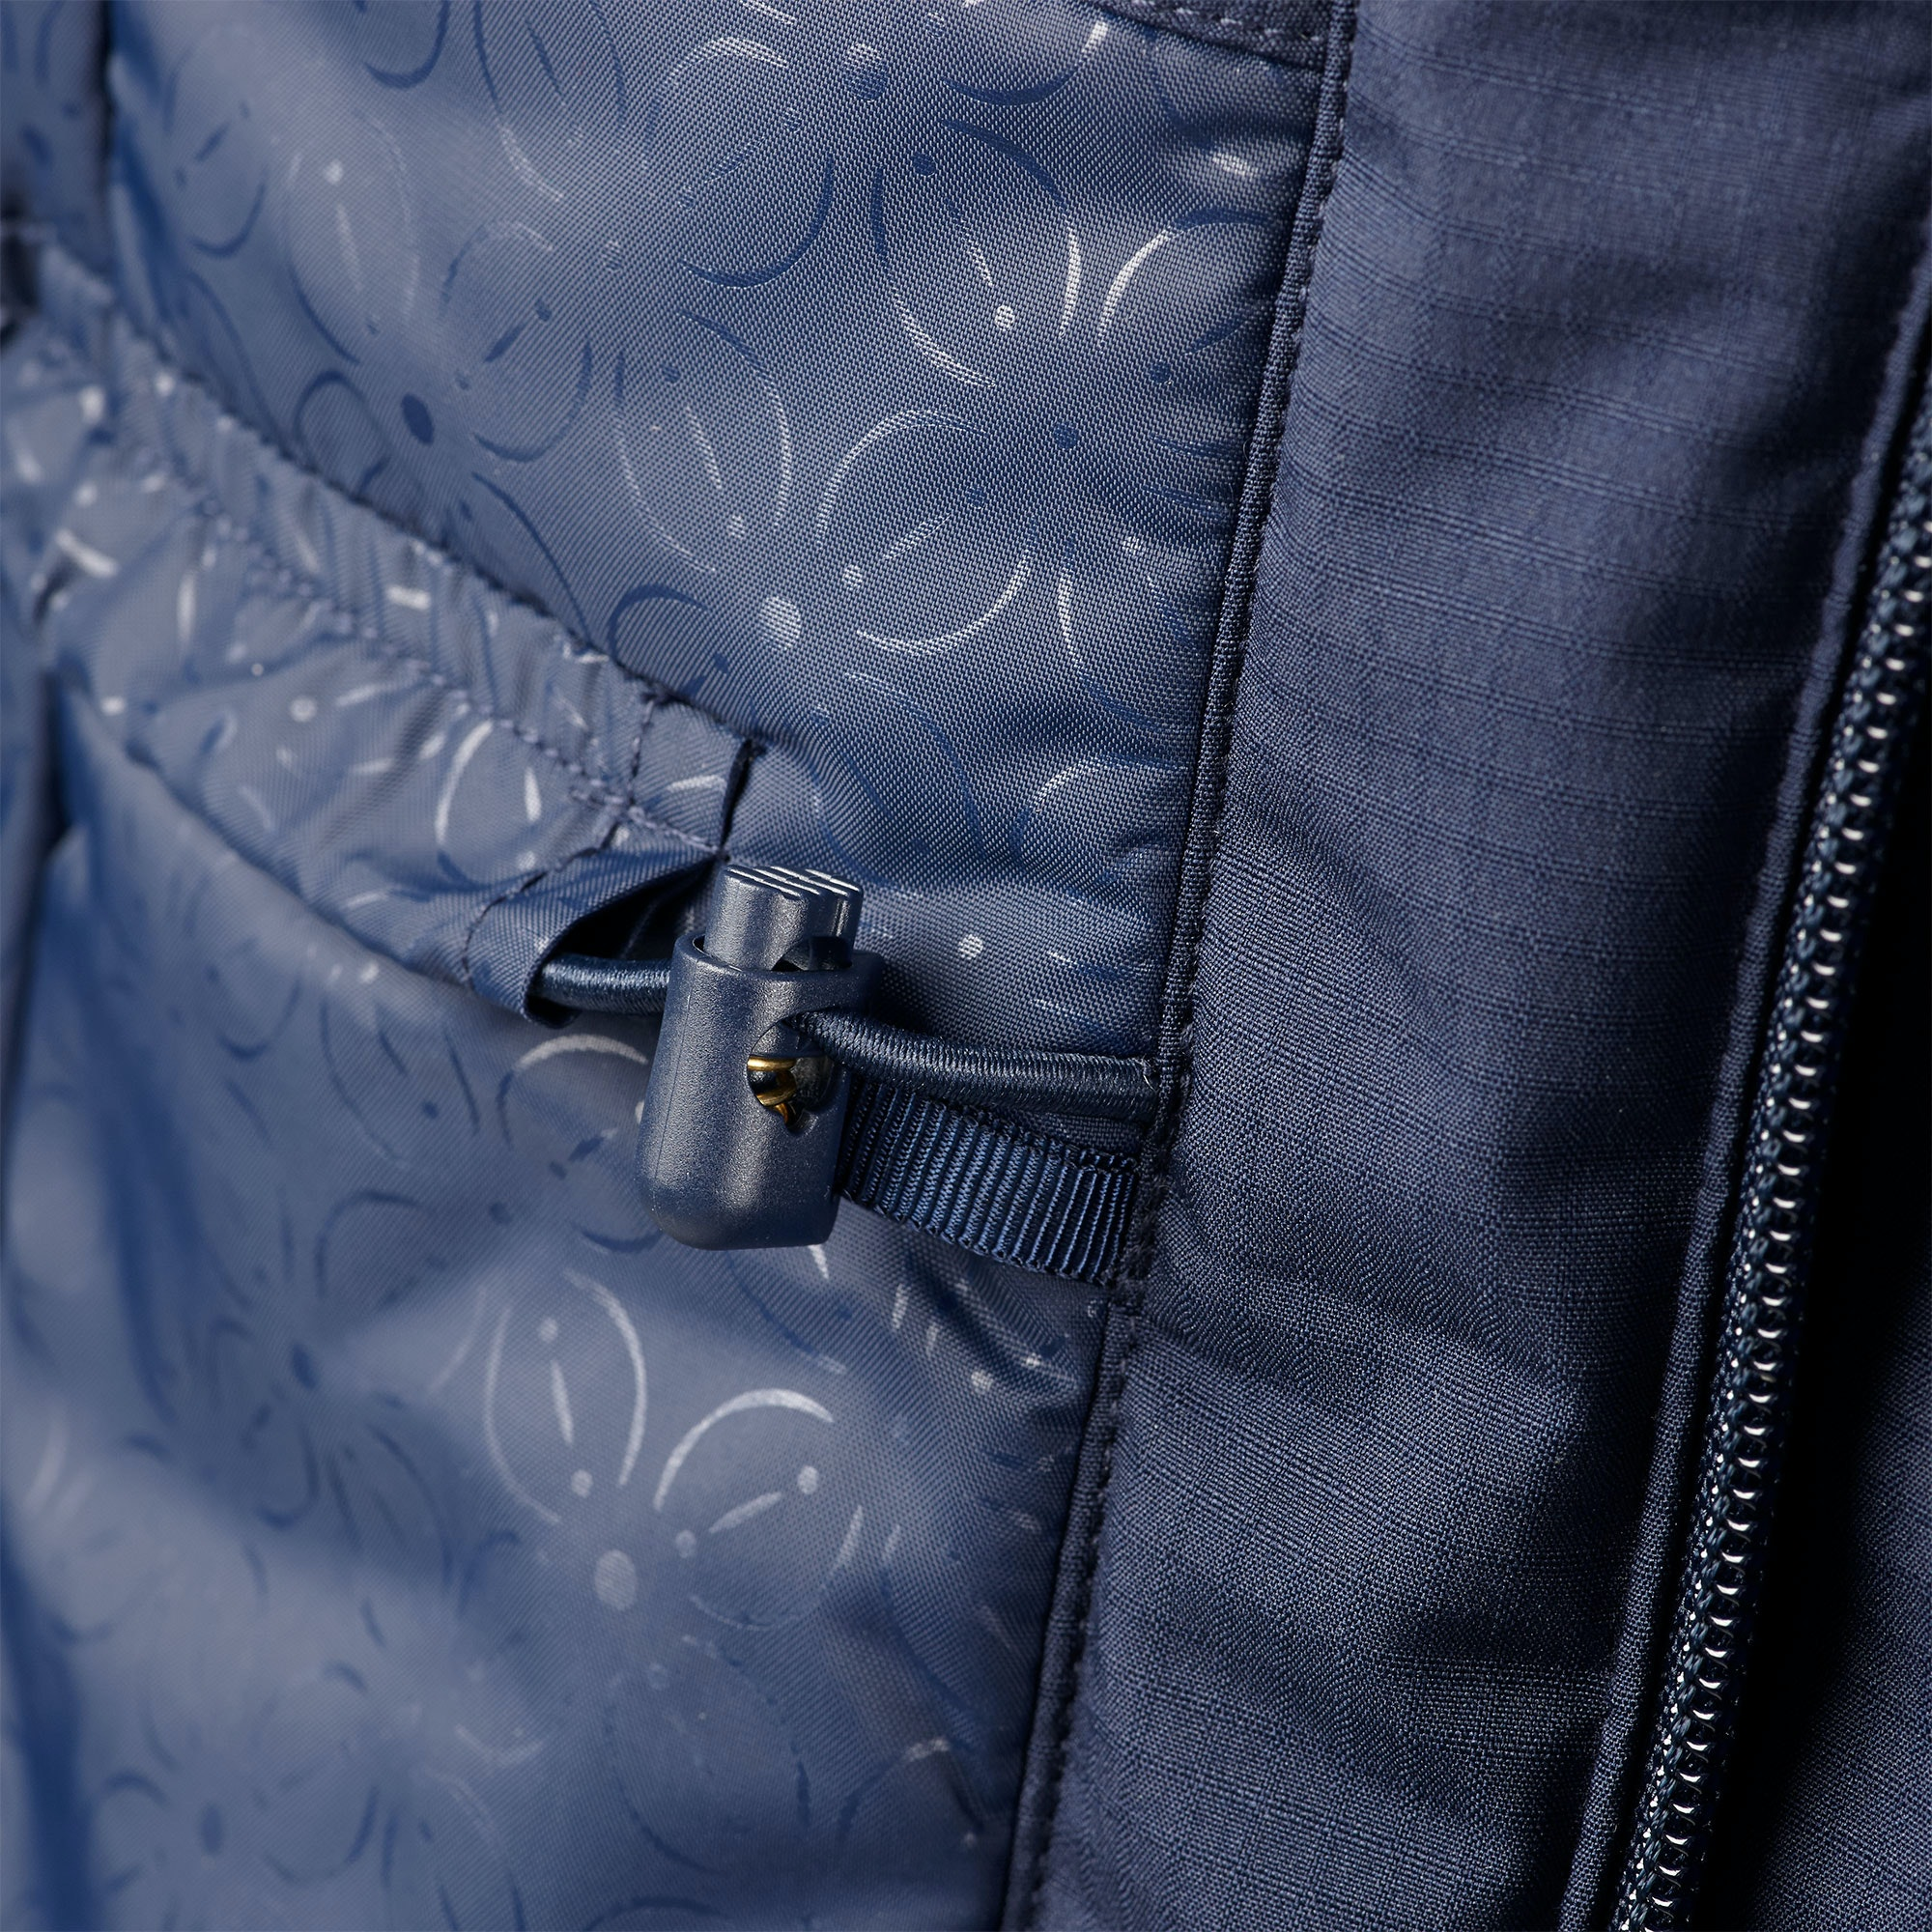 Kathmandu-Percell-Womens-Waterproof-Jacket-Insulated-Long-Length-Trench-Coat-v3